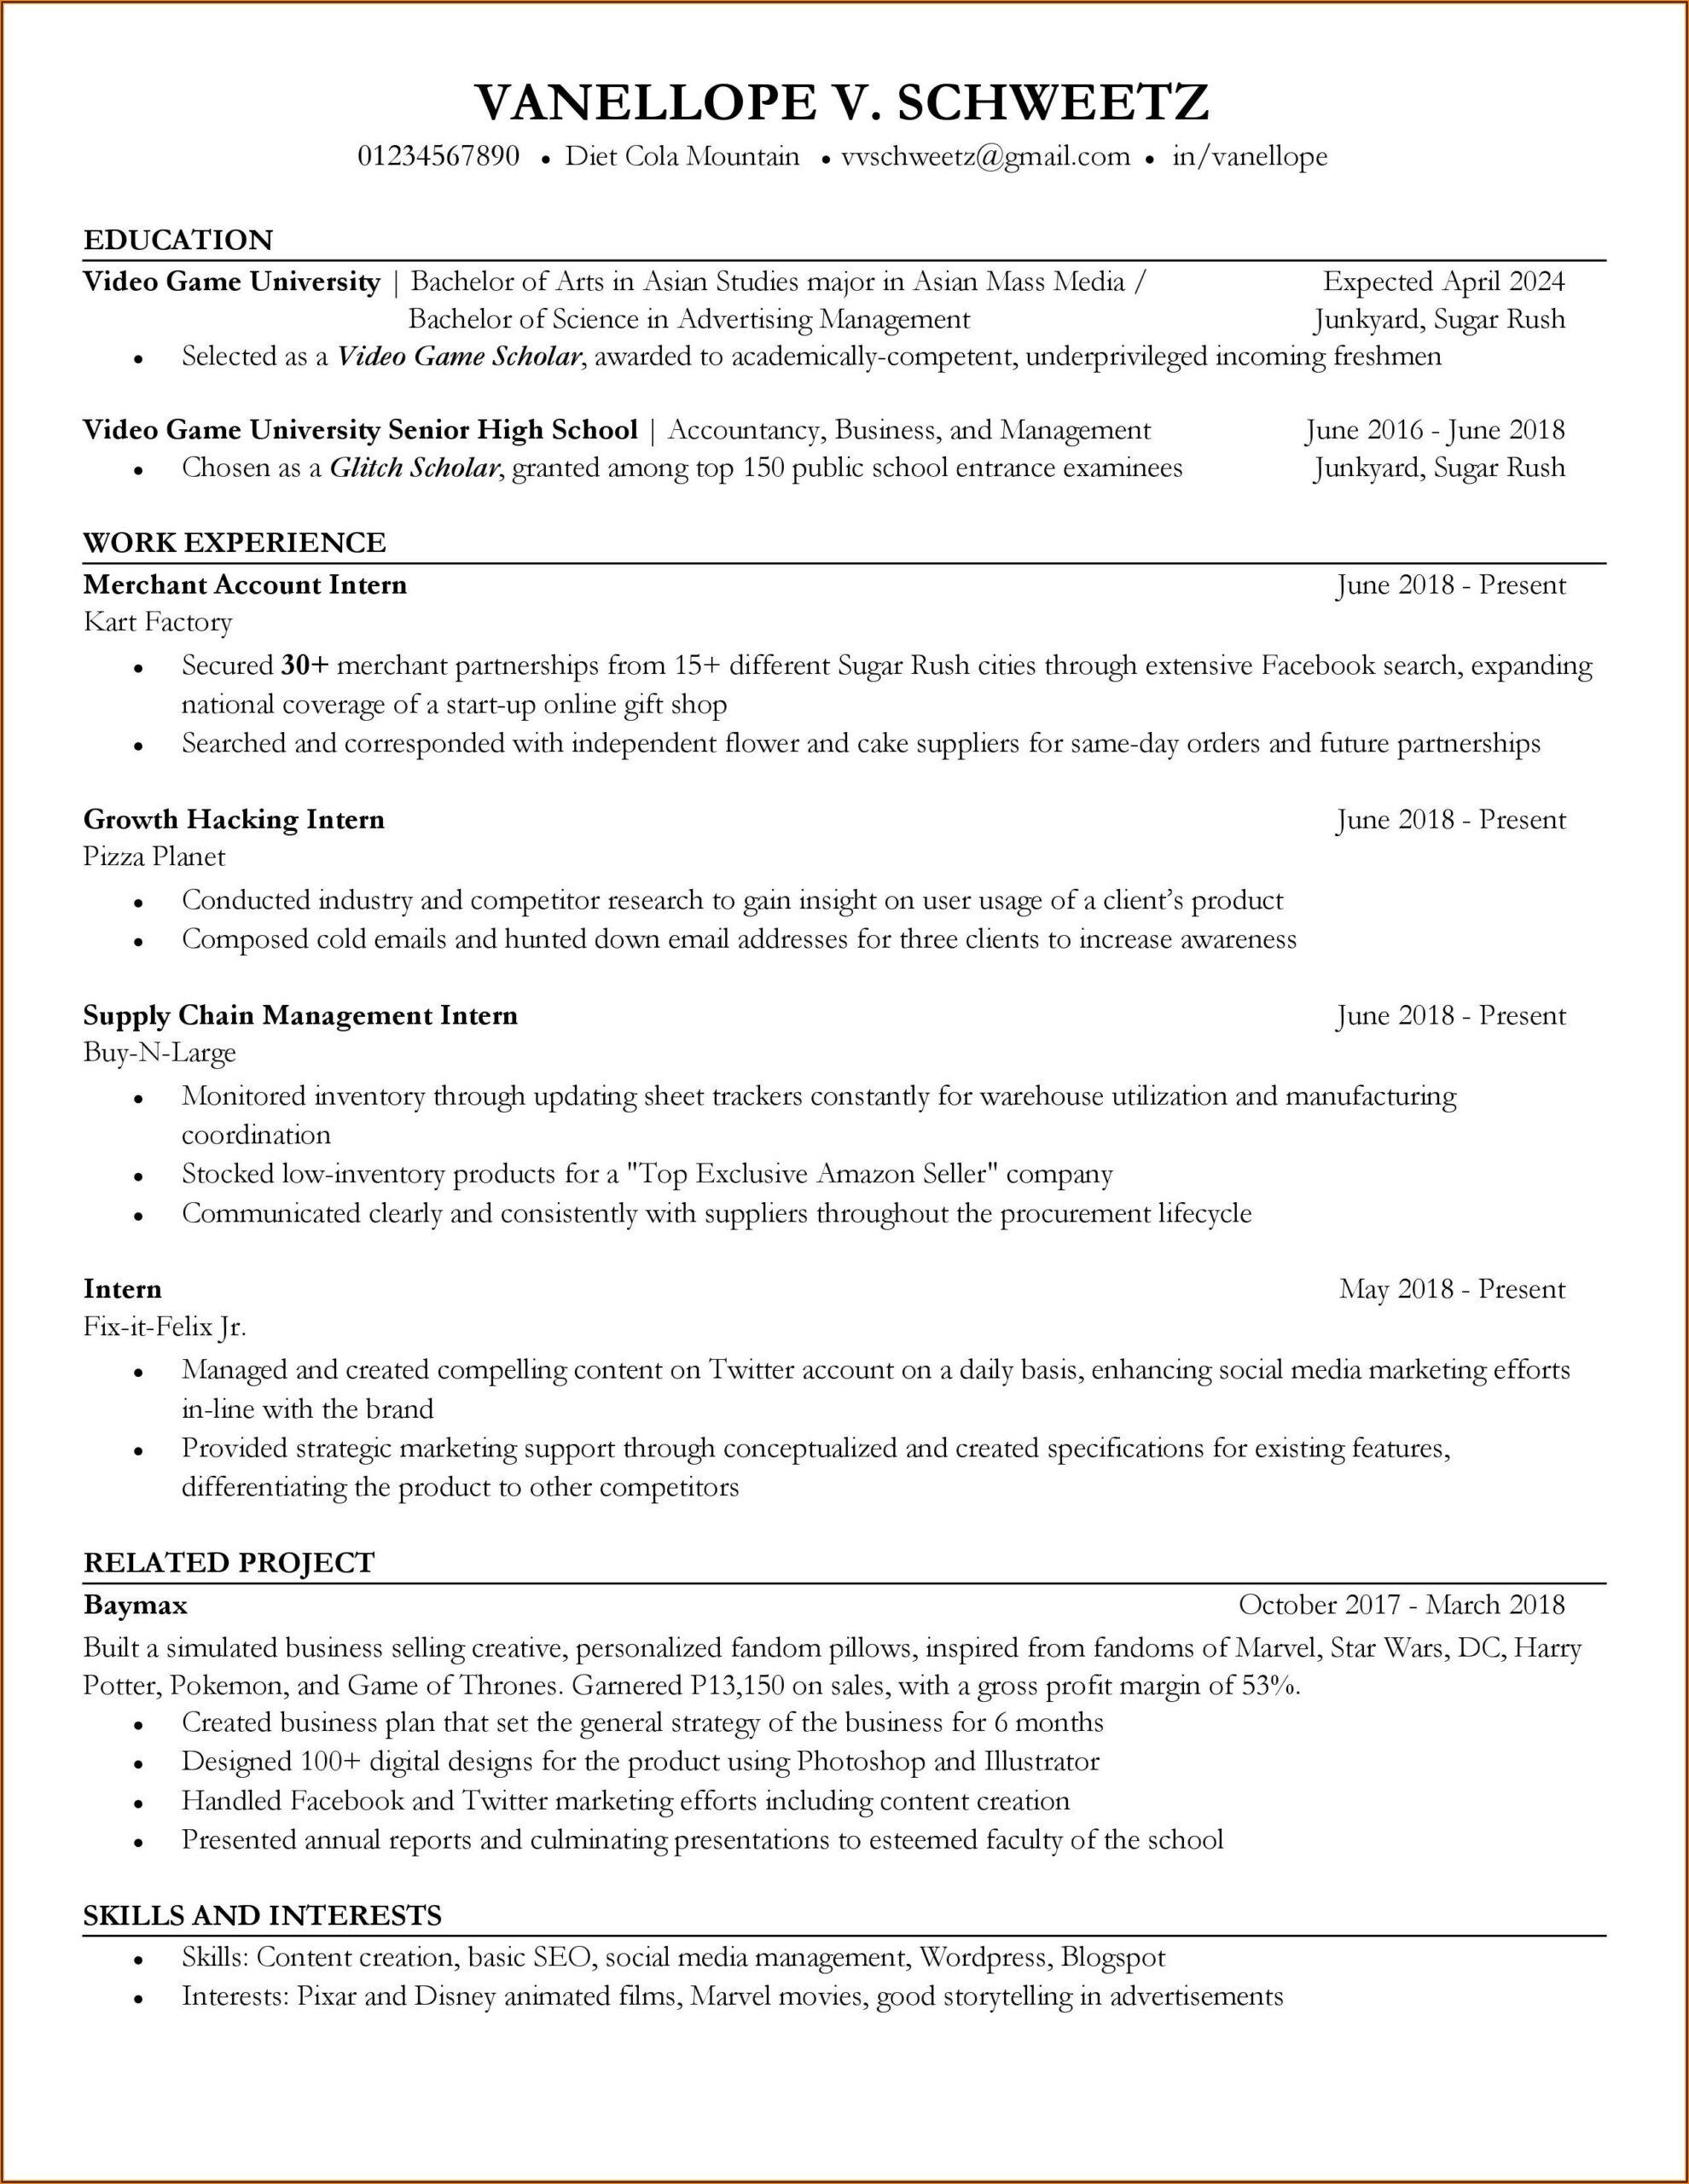 Free Resume Builder And Download Reddit